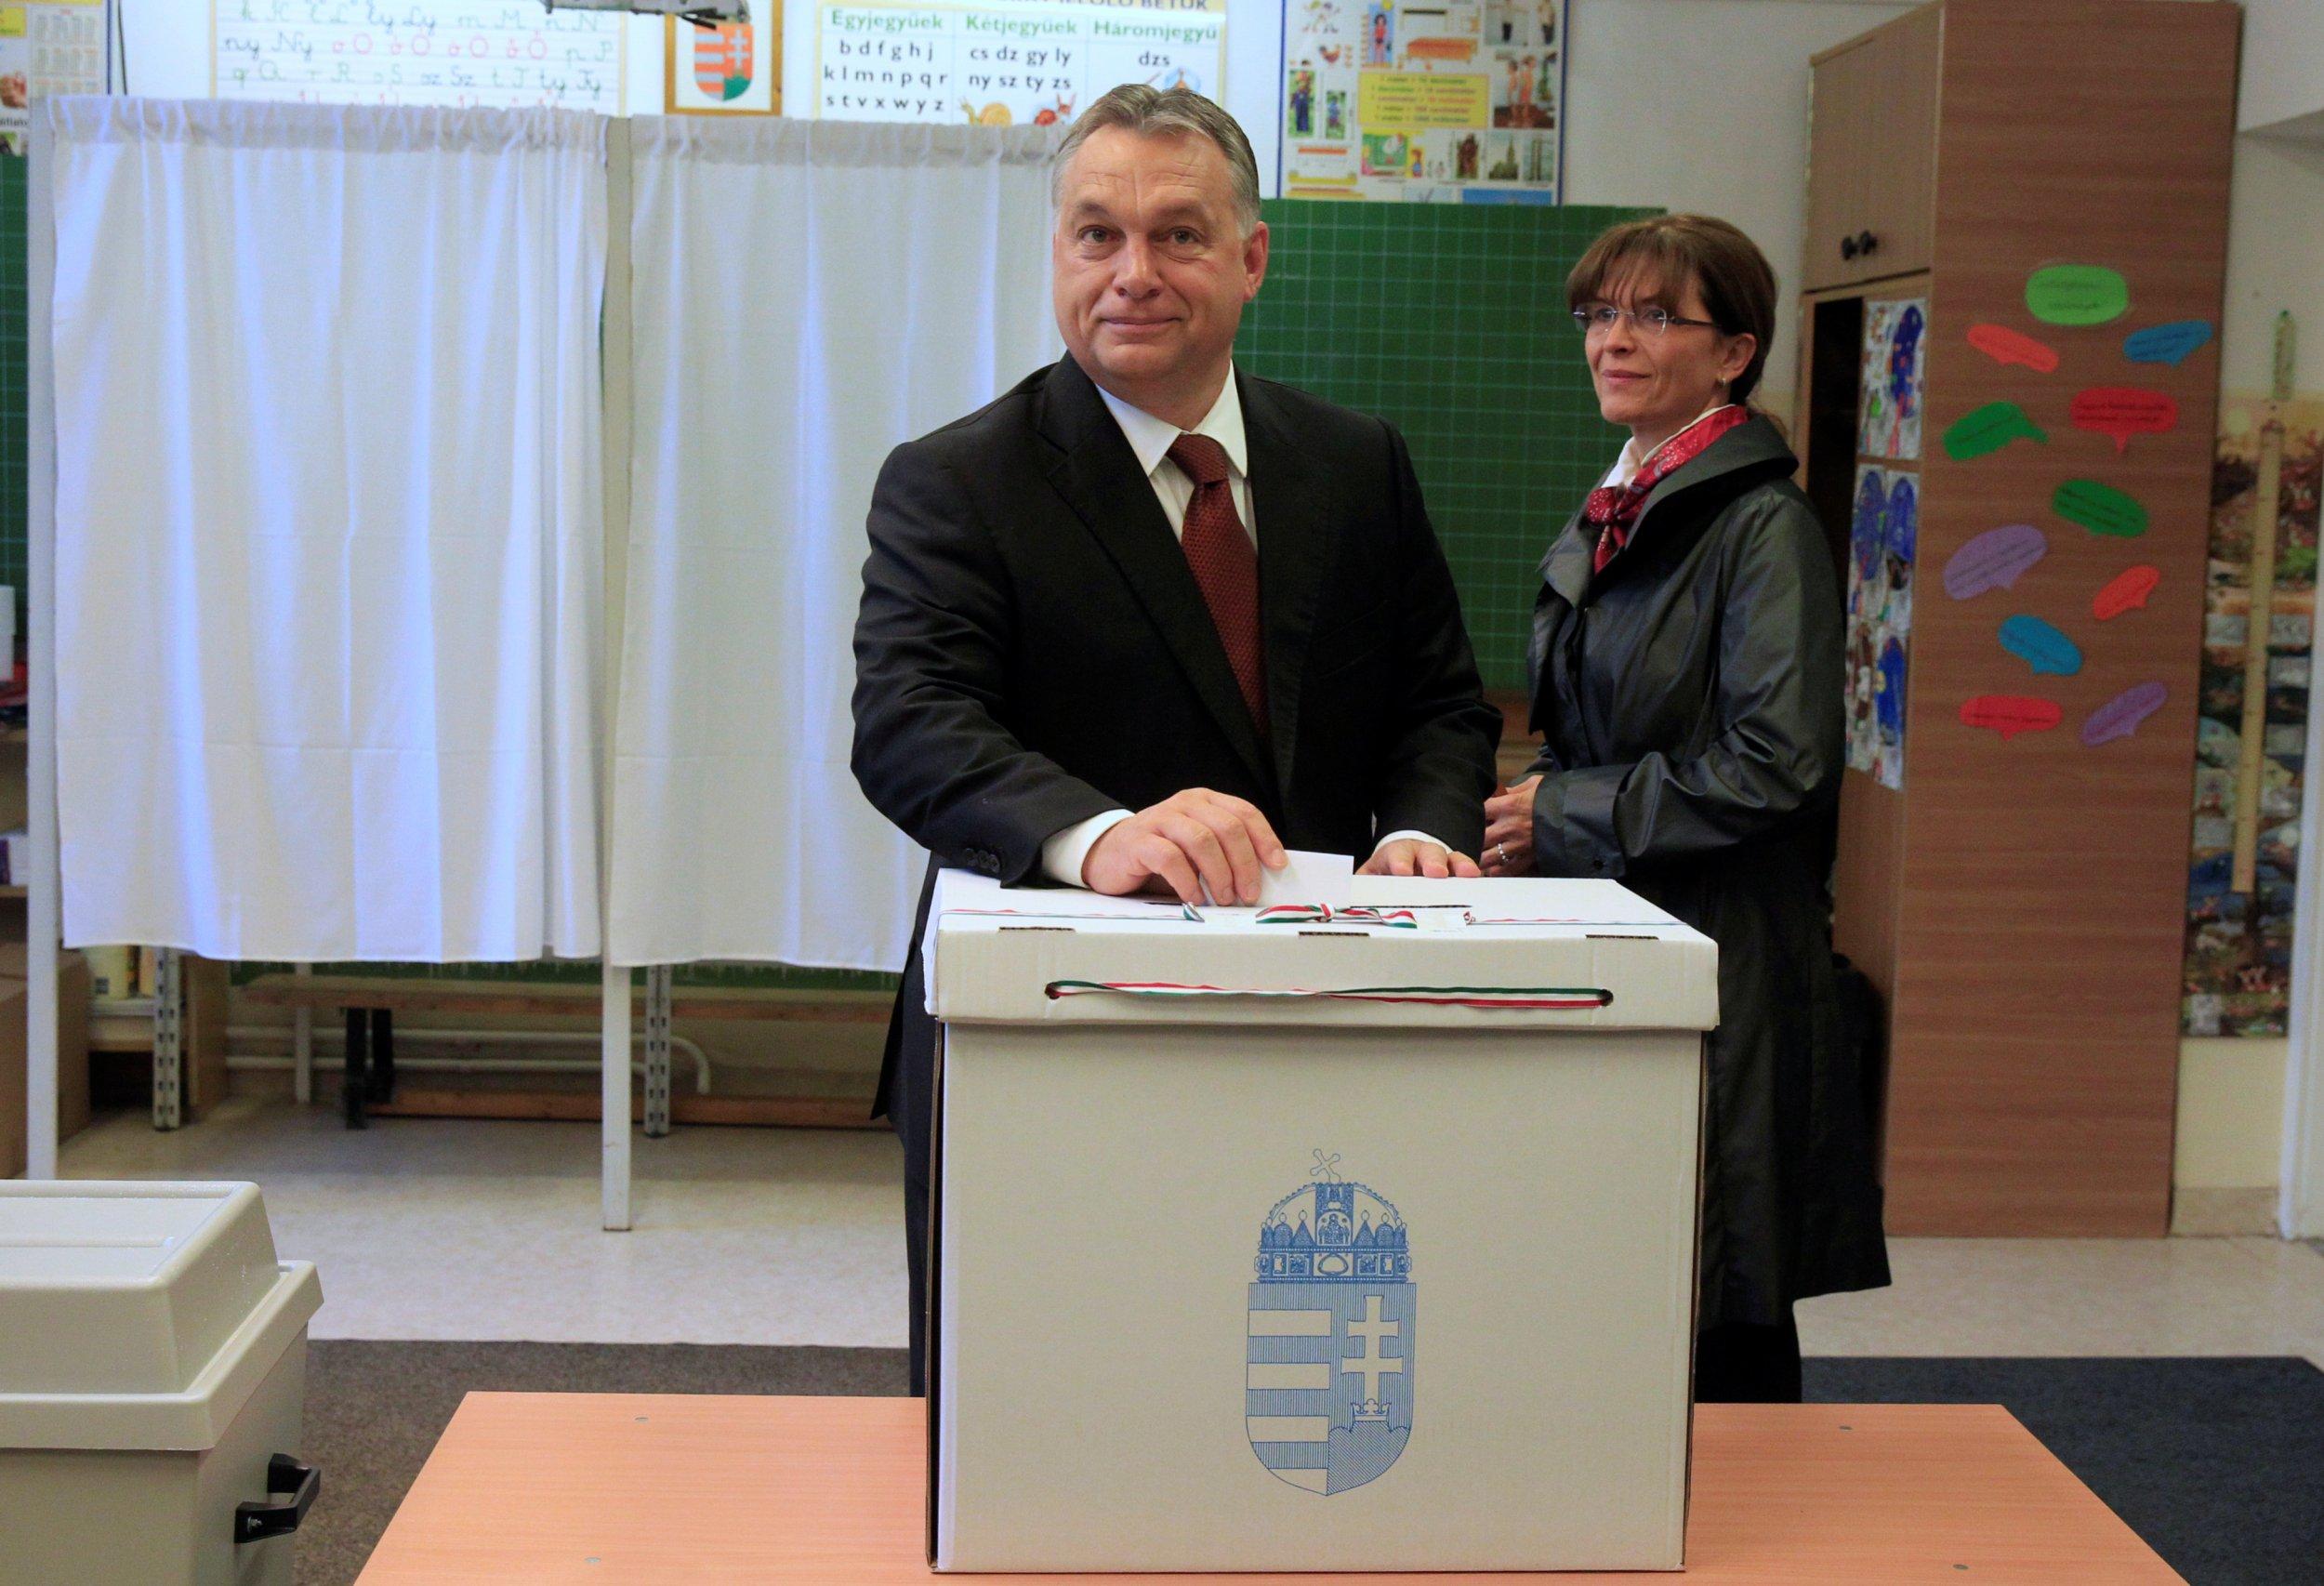 Viktor Orban votes